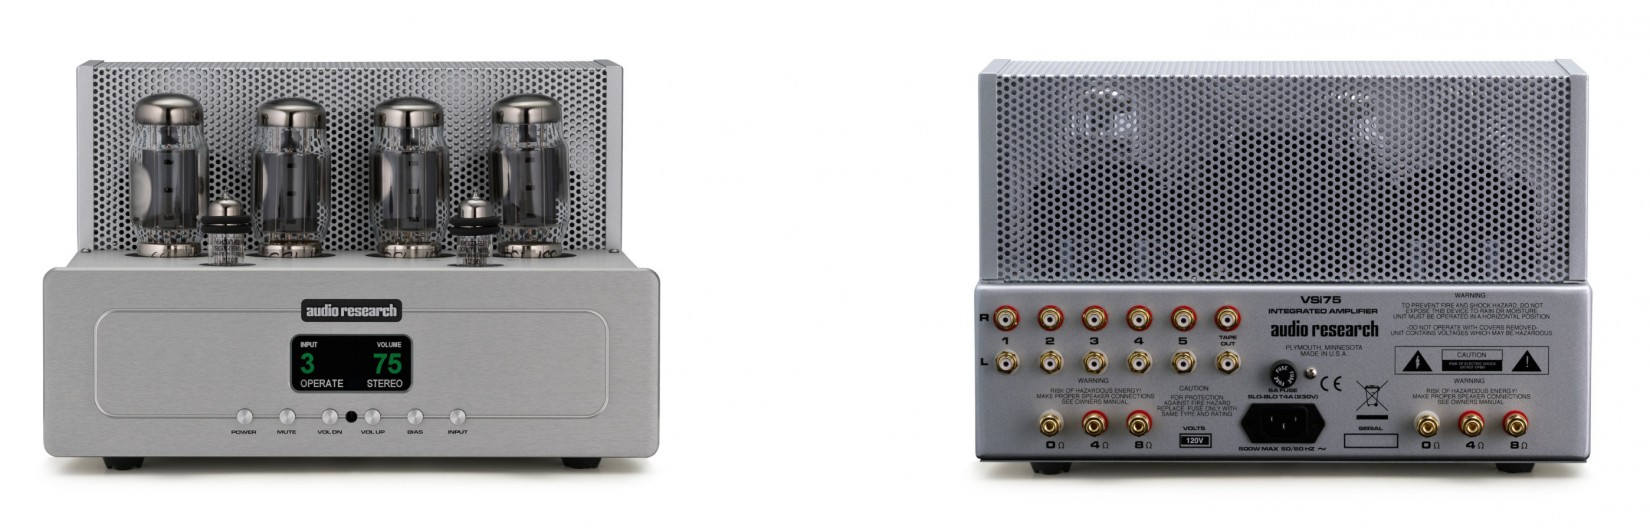 Audio-Research-VS 75i-4